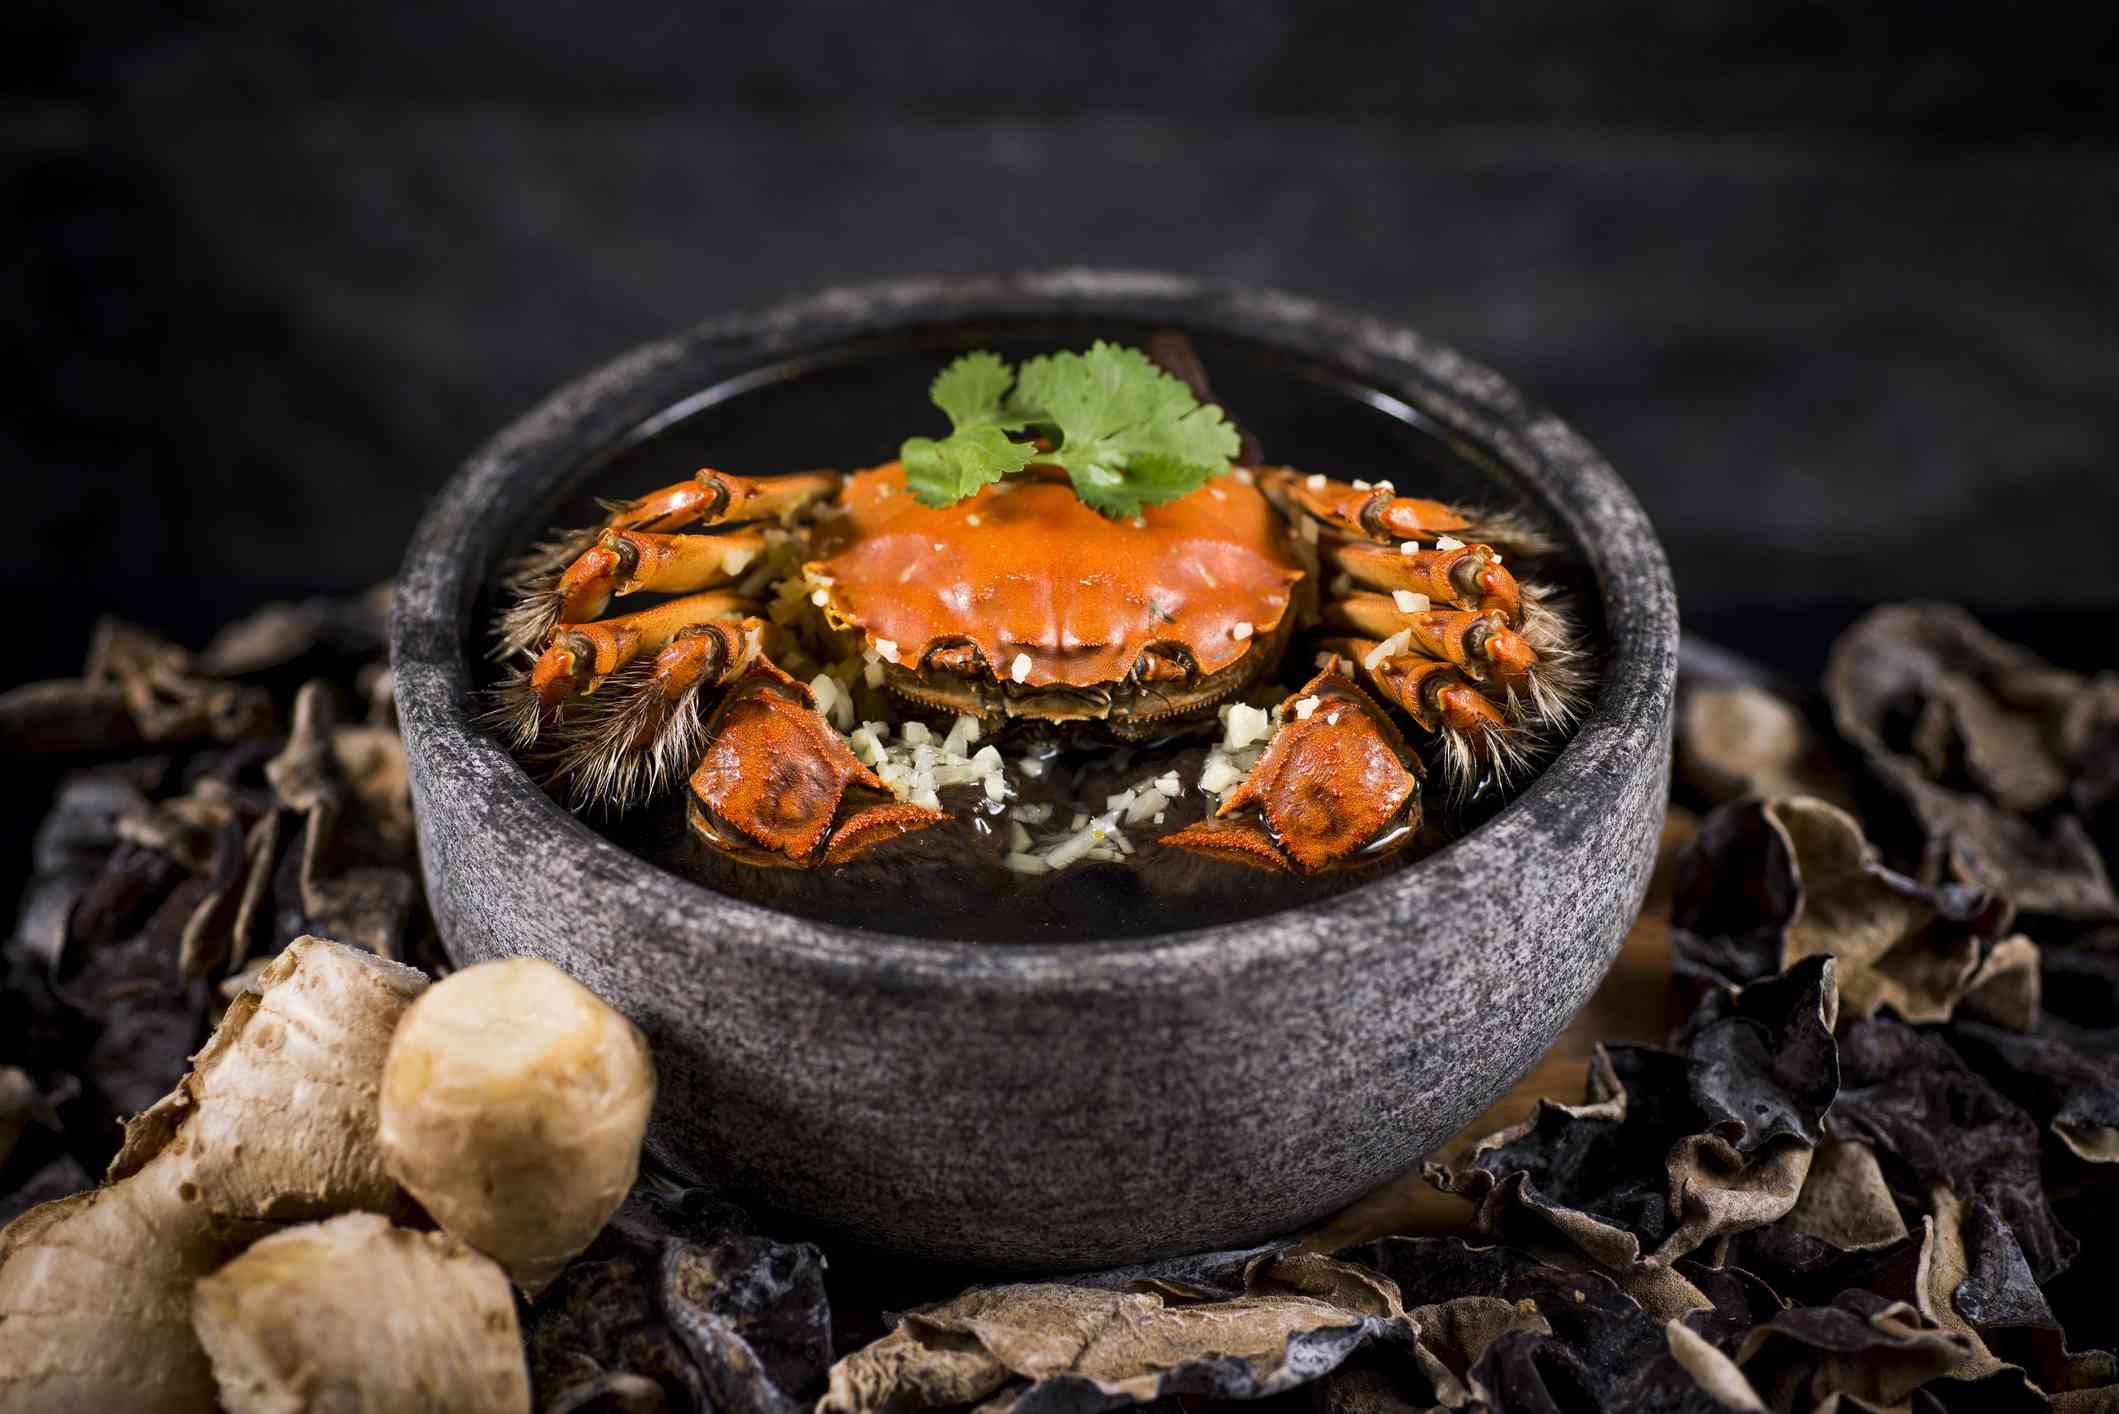 Steam hairy crab